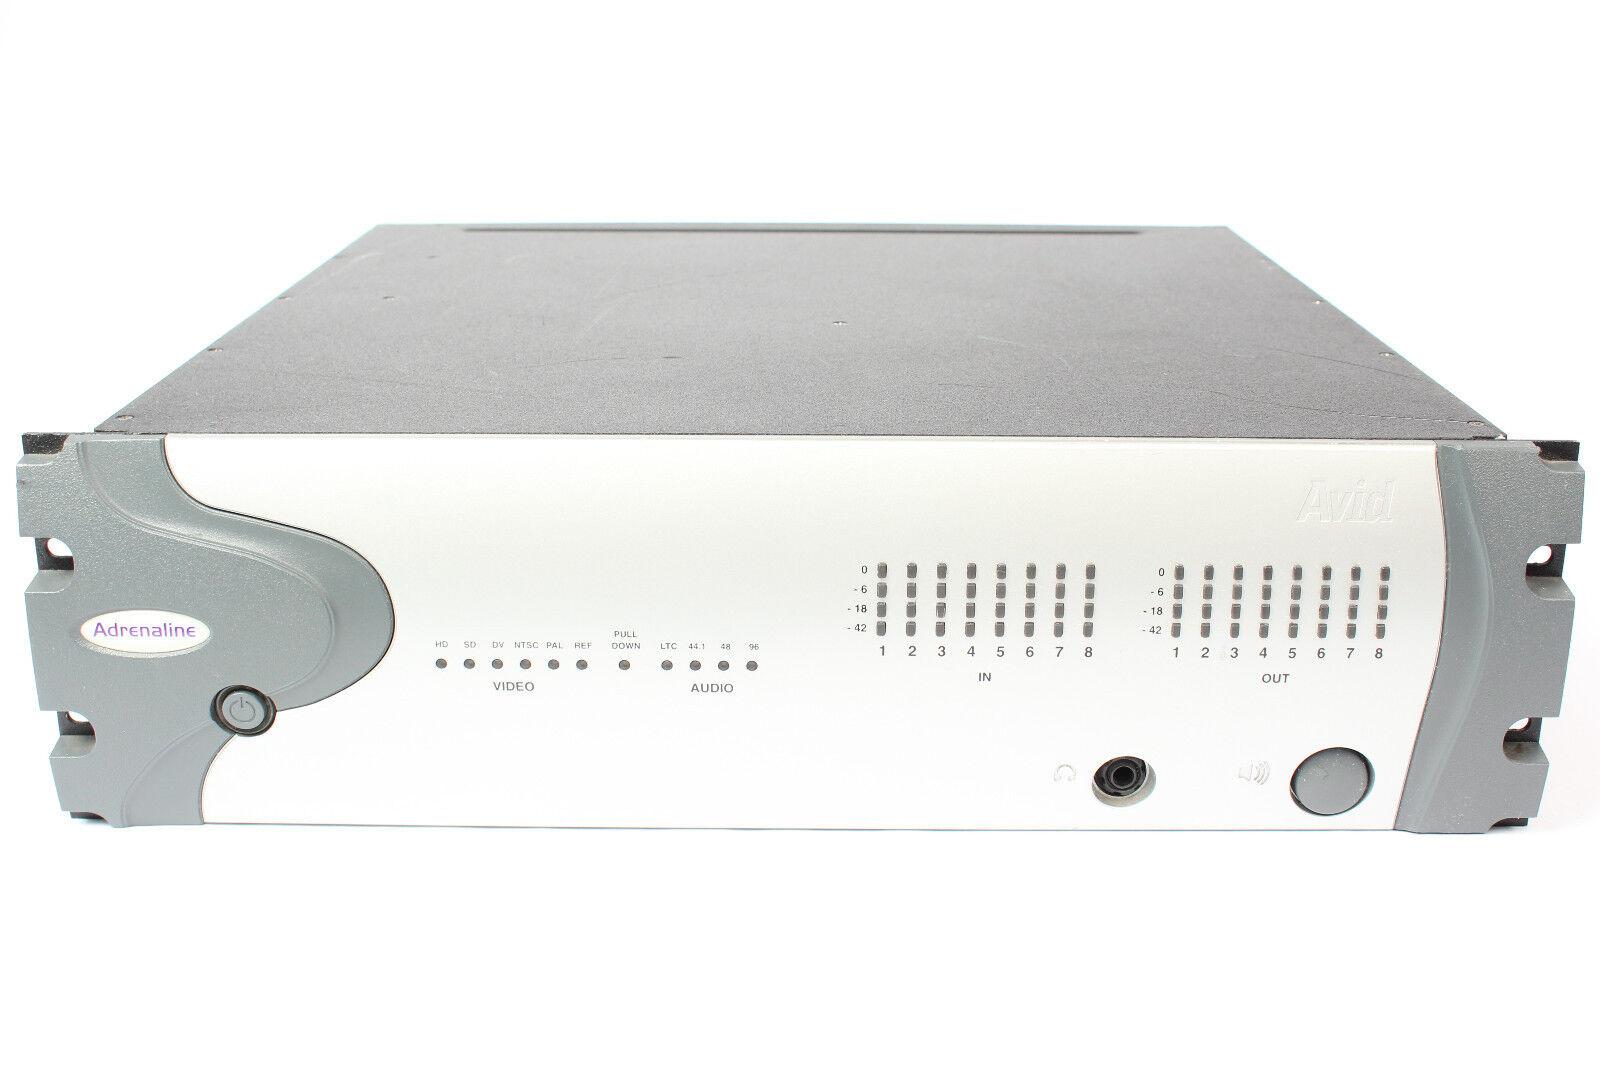 Avid Adrenaline HD Breakout Box w  DNxcel Expansion 0020-03332-02 Rev A